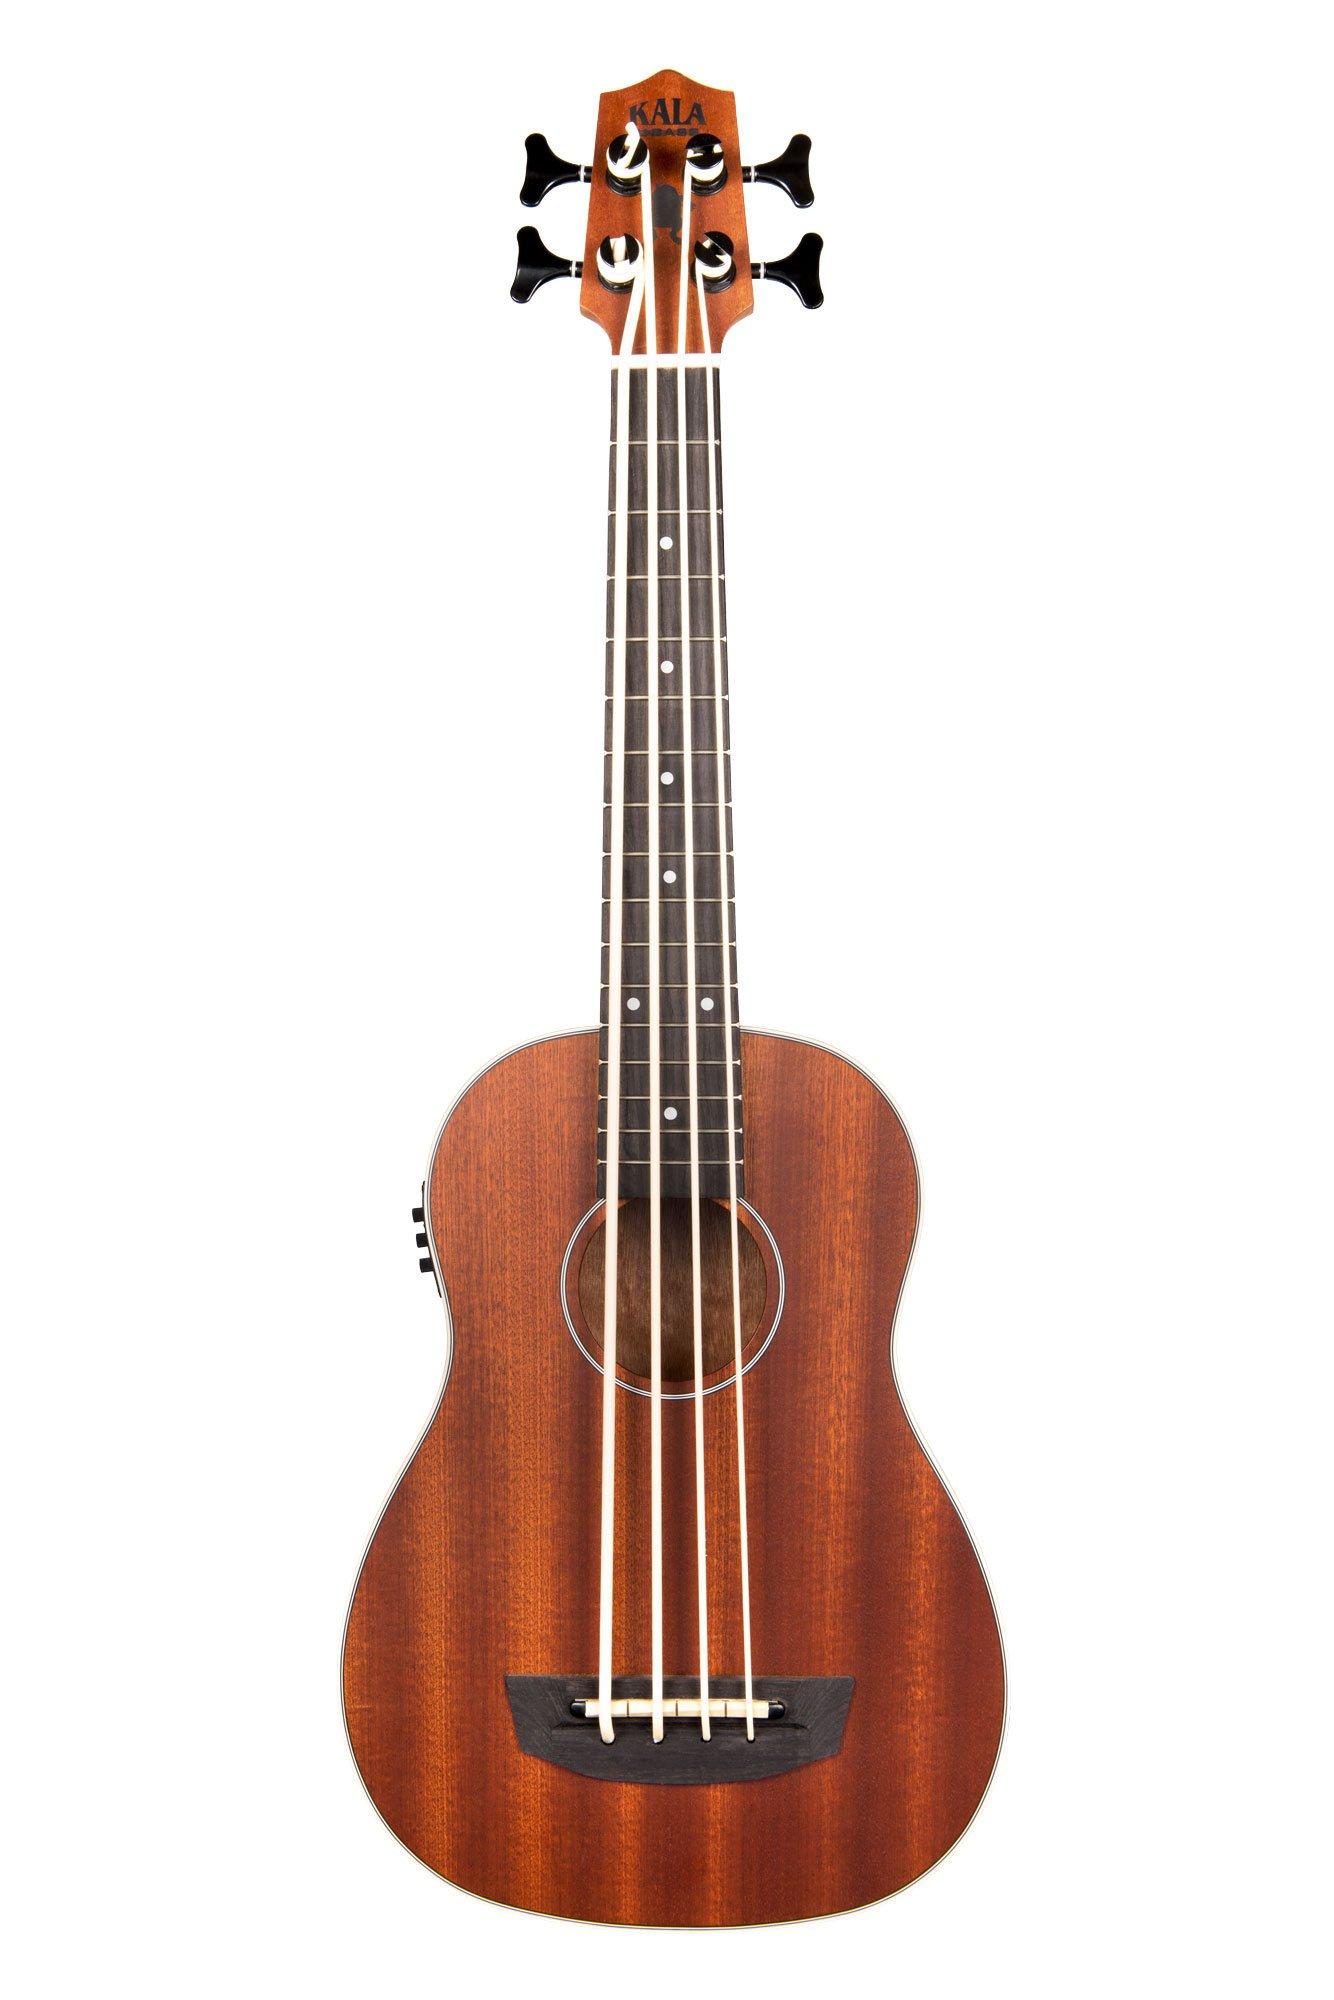 Kala U-Bass-PSGR-FS Passenger Acoustic-Electric U-Bass Ukulele Bundle with Gig Bag, Tuner, Austin Bazaar Instructional DVD, and Polishing Cloth by Kala (Image #2)